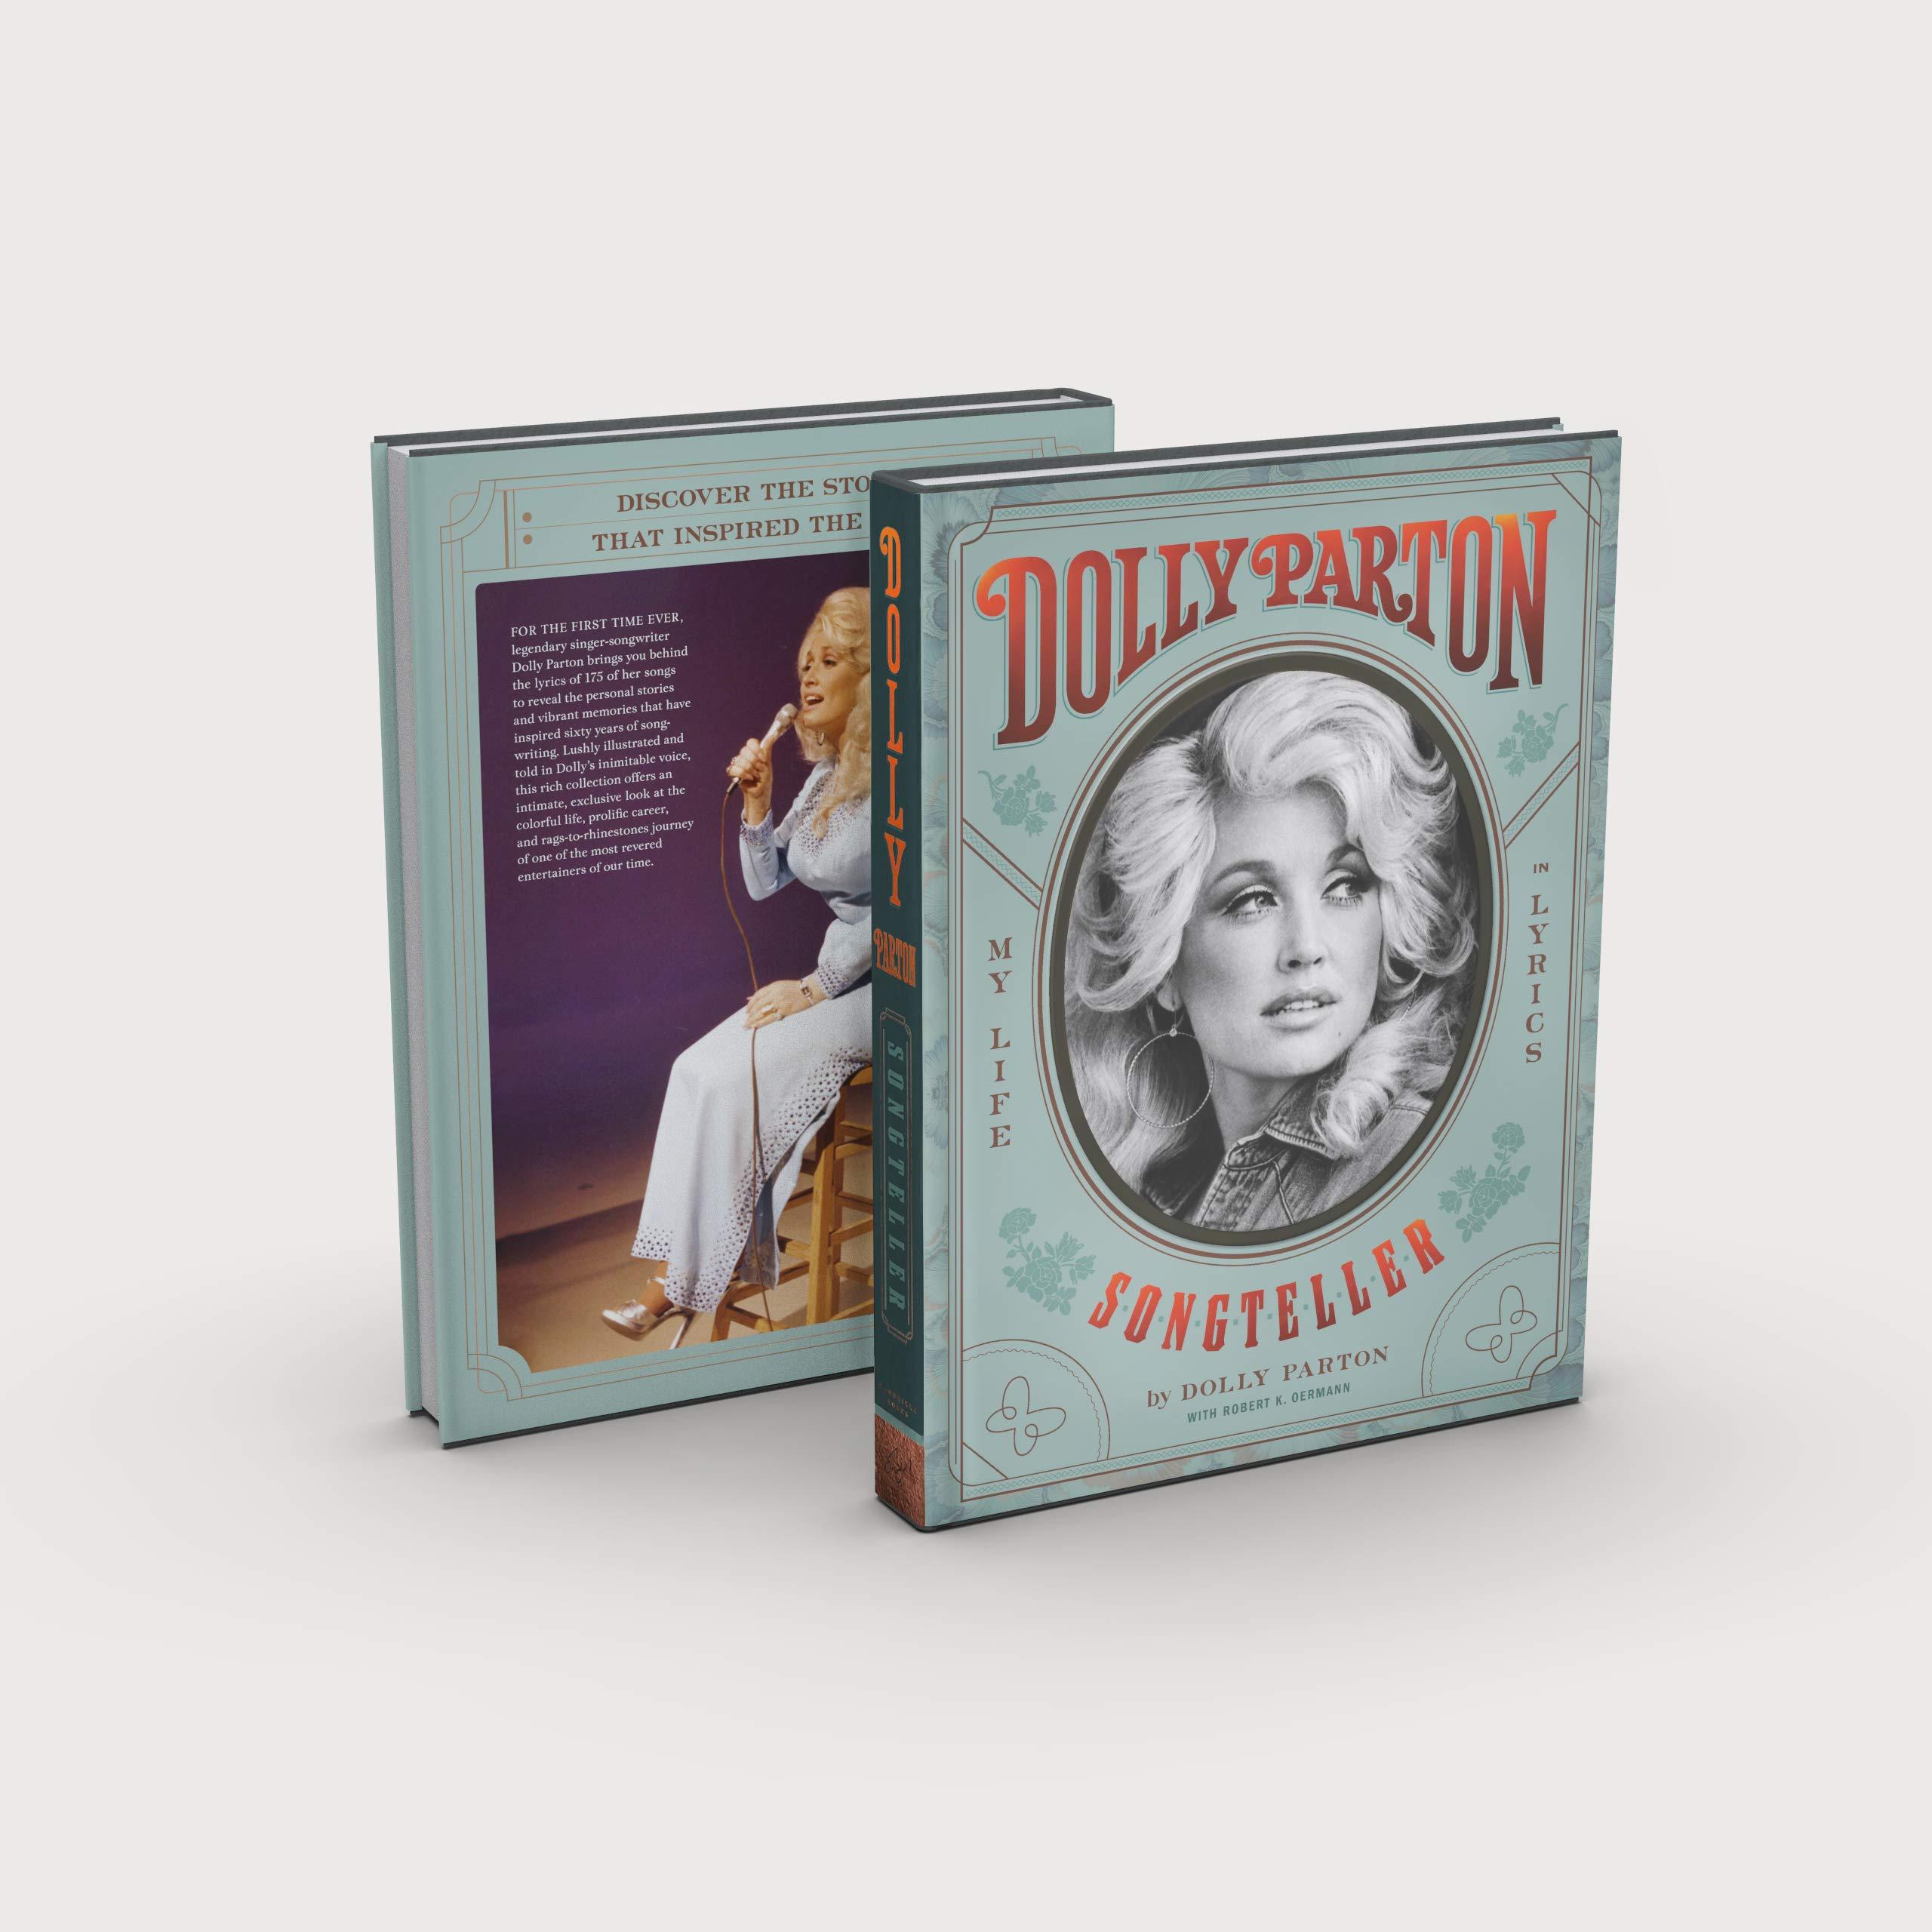 Dolly Parton Songteller Lyric Book